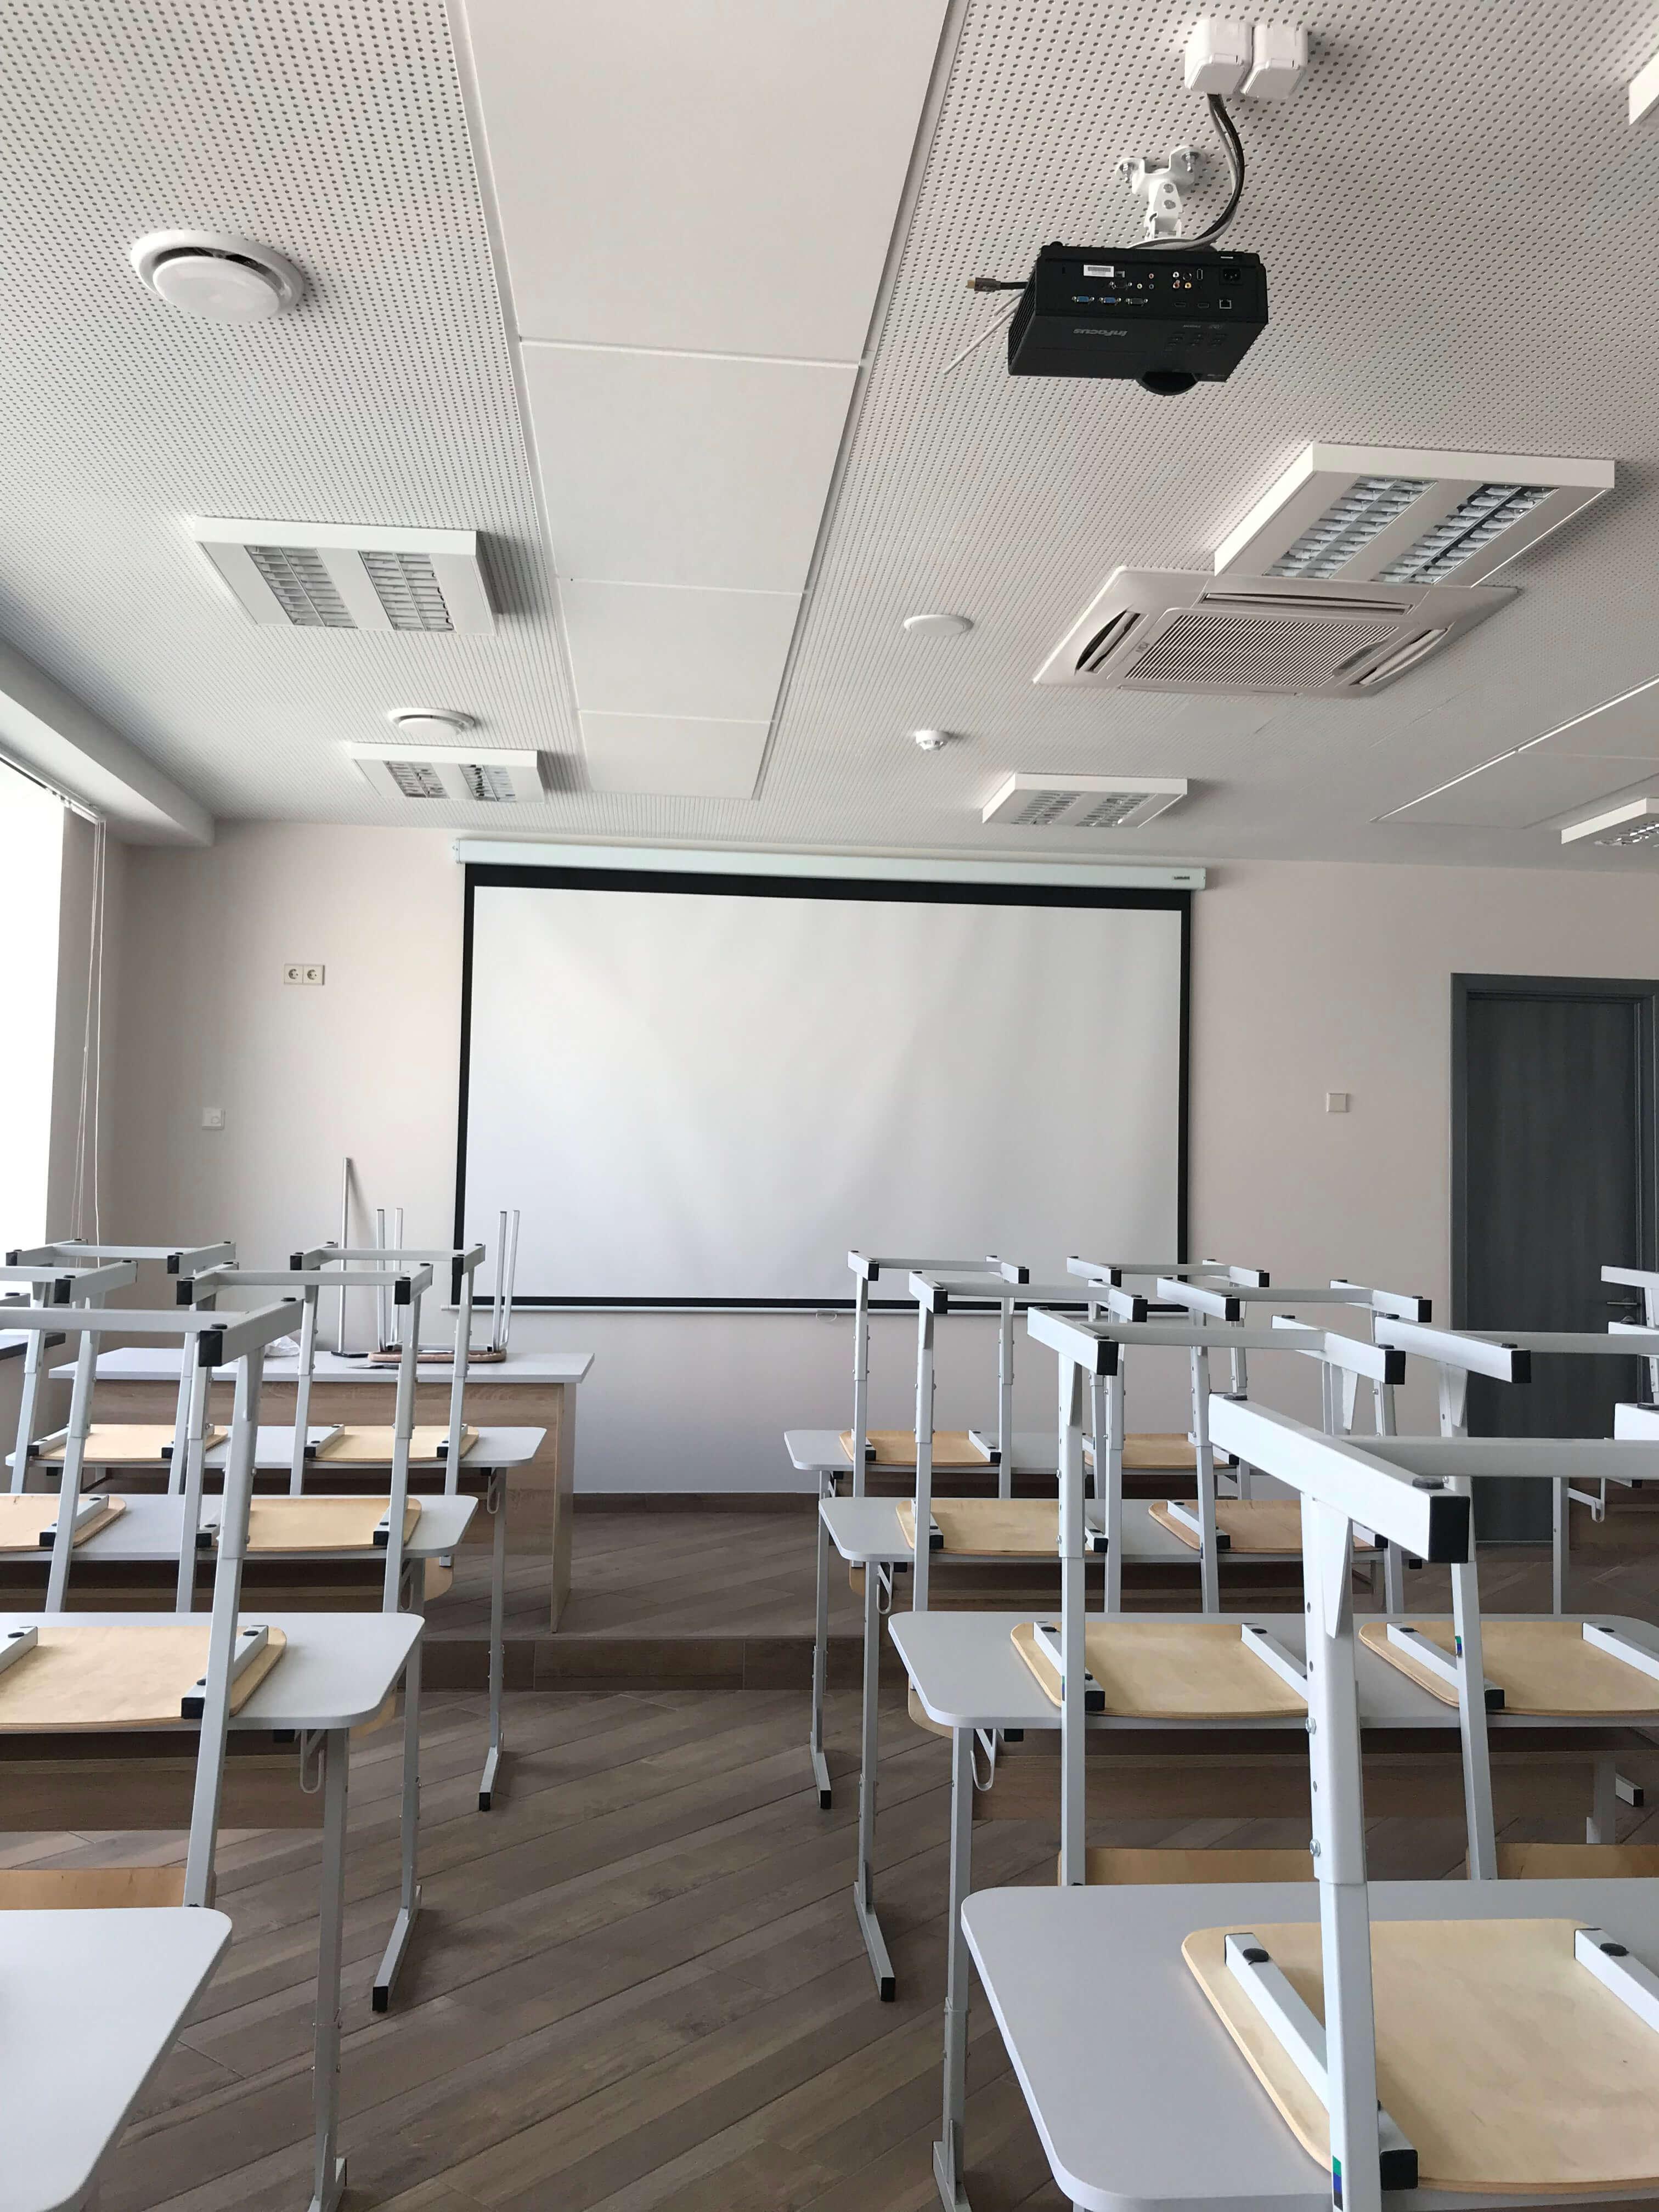 2 фото Школа в Дроздах